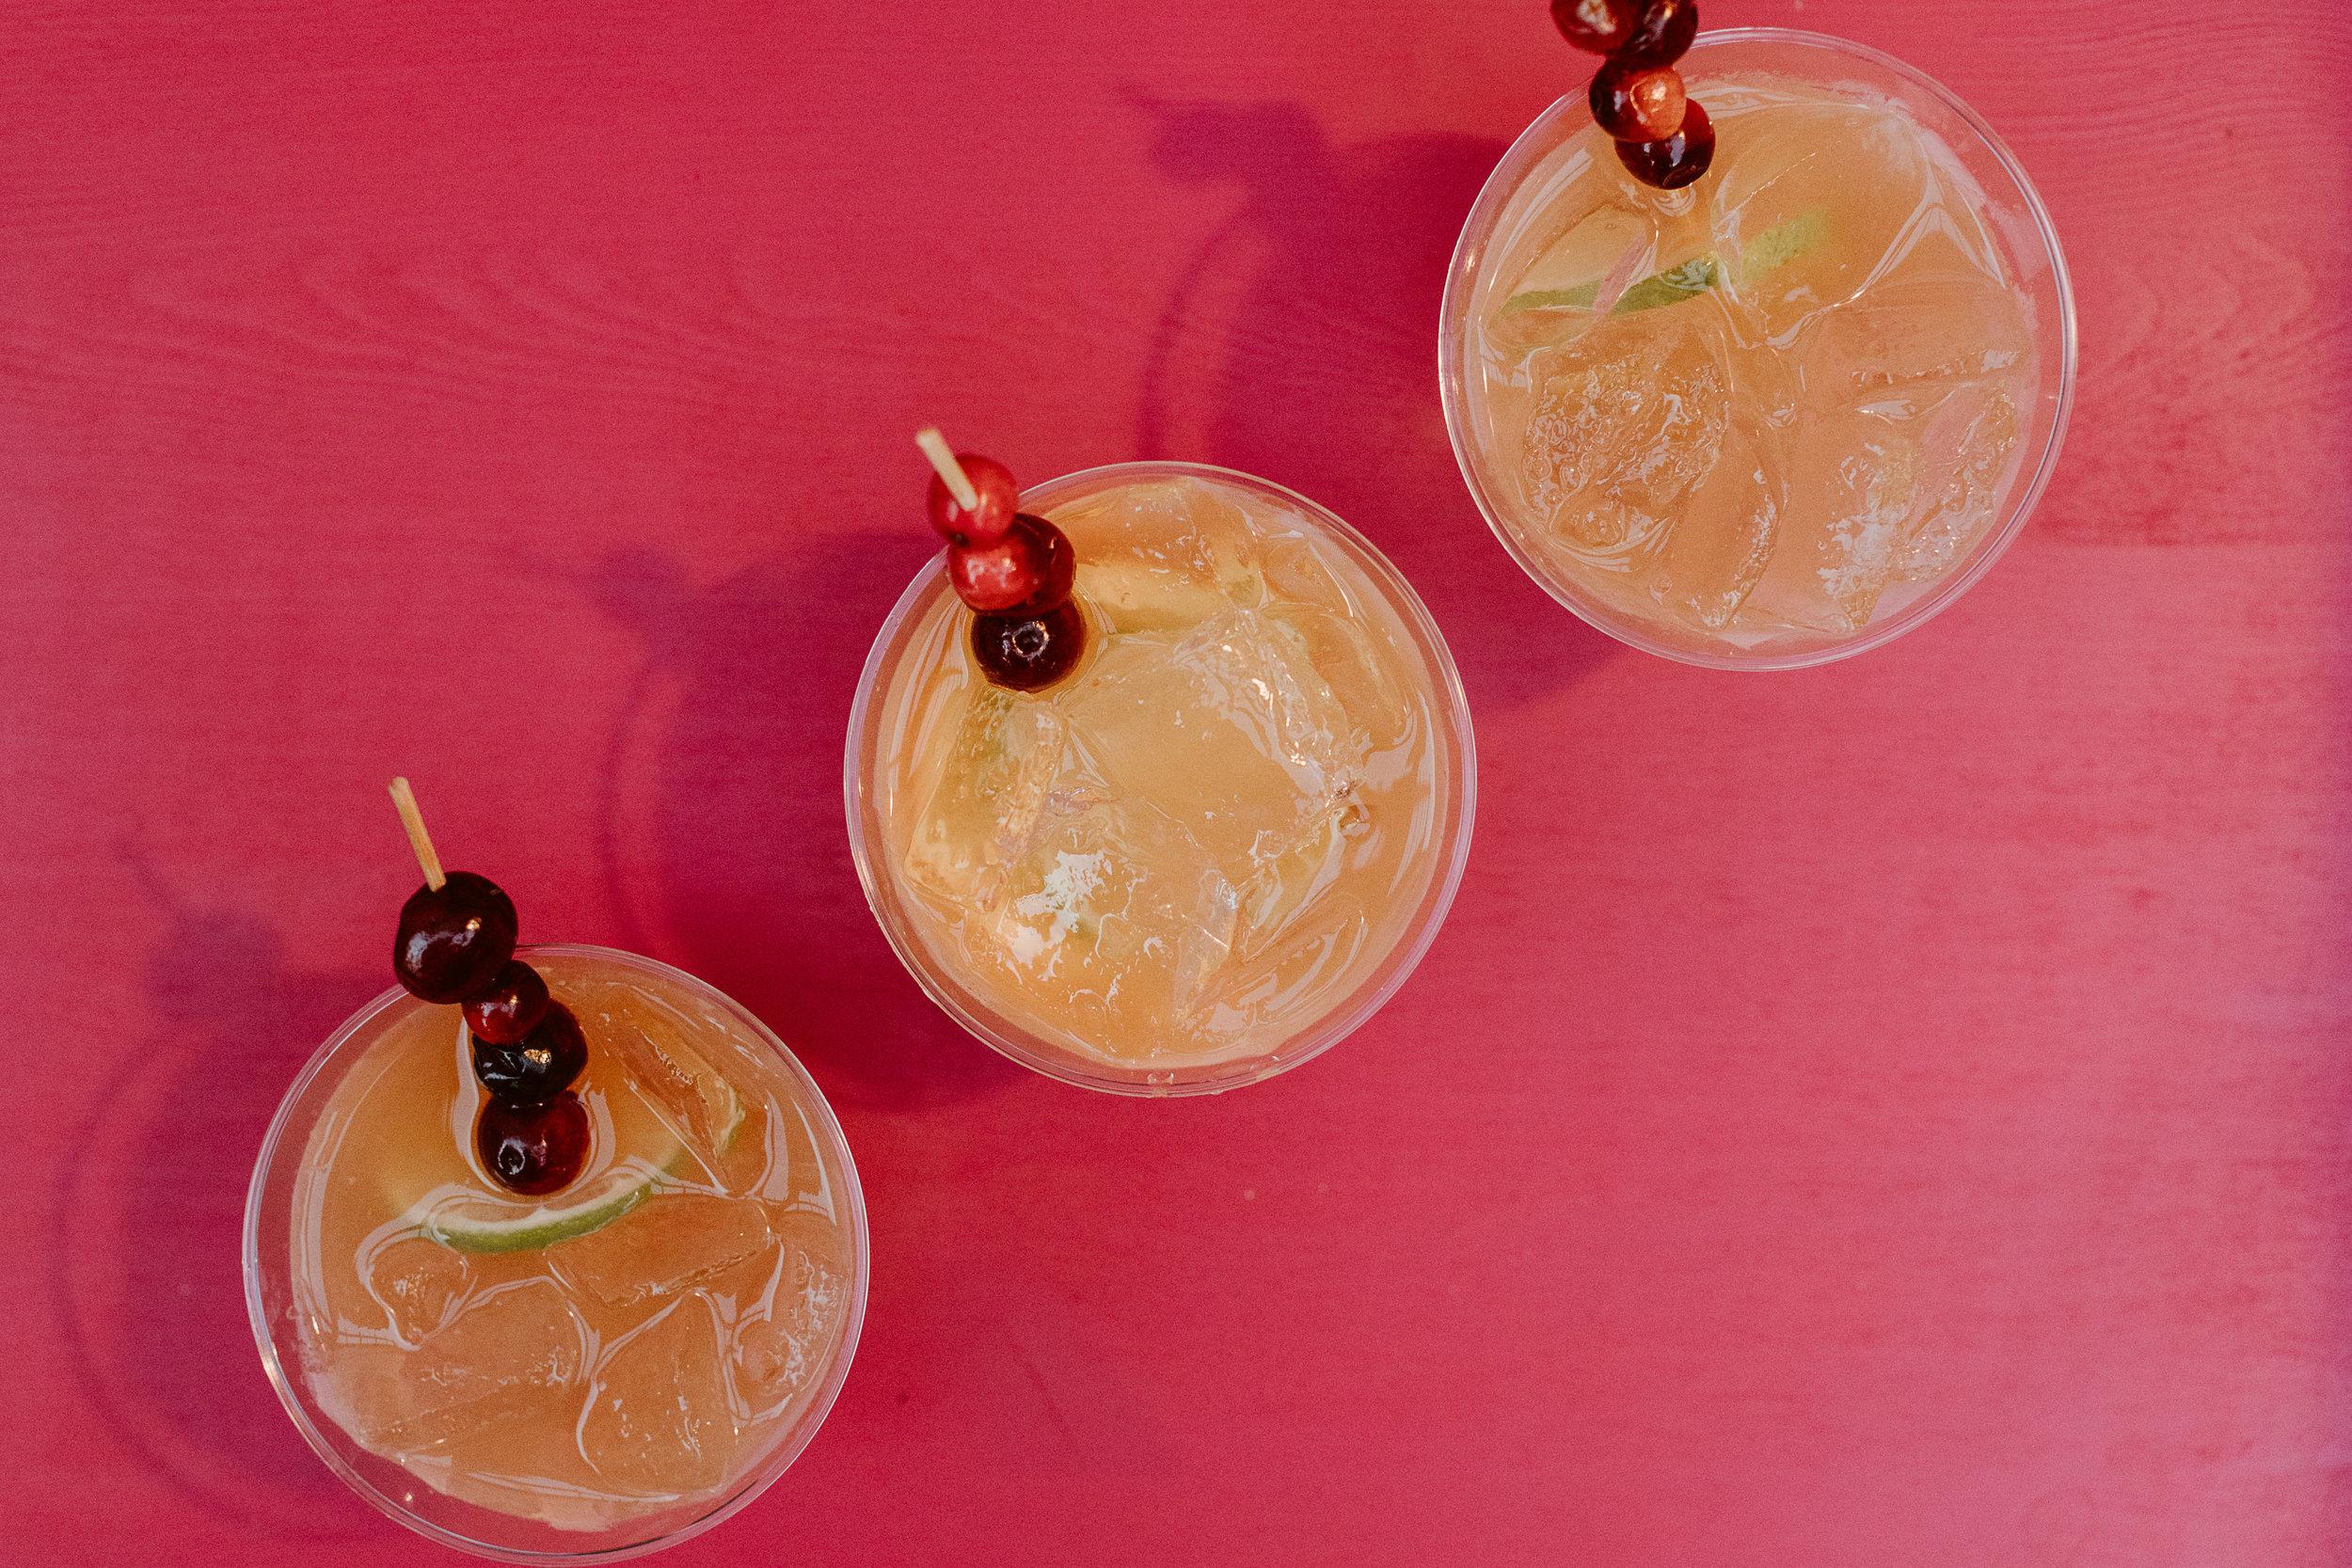 Holiday mai tai's courtesy of Havana Club Rum | drinkingwithchickens.com